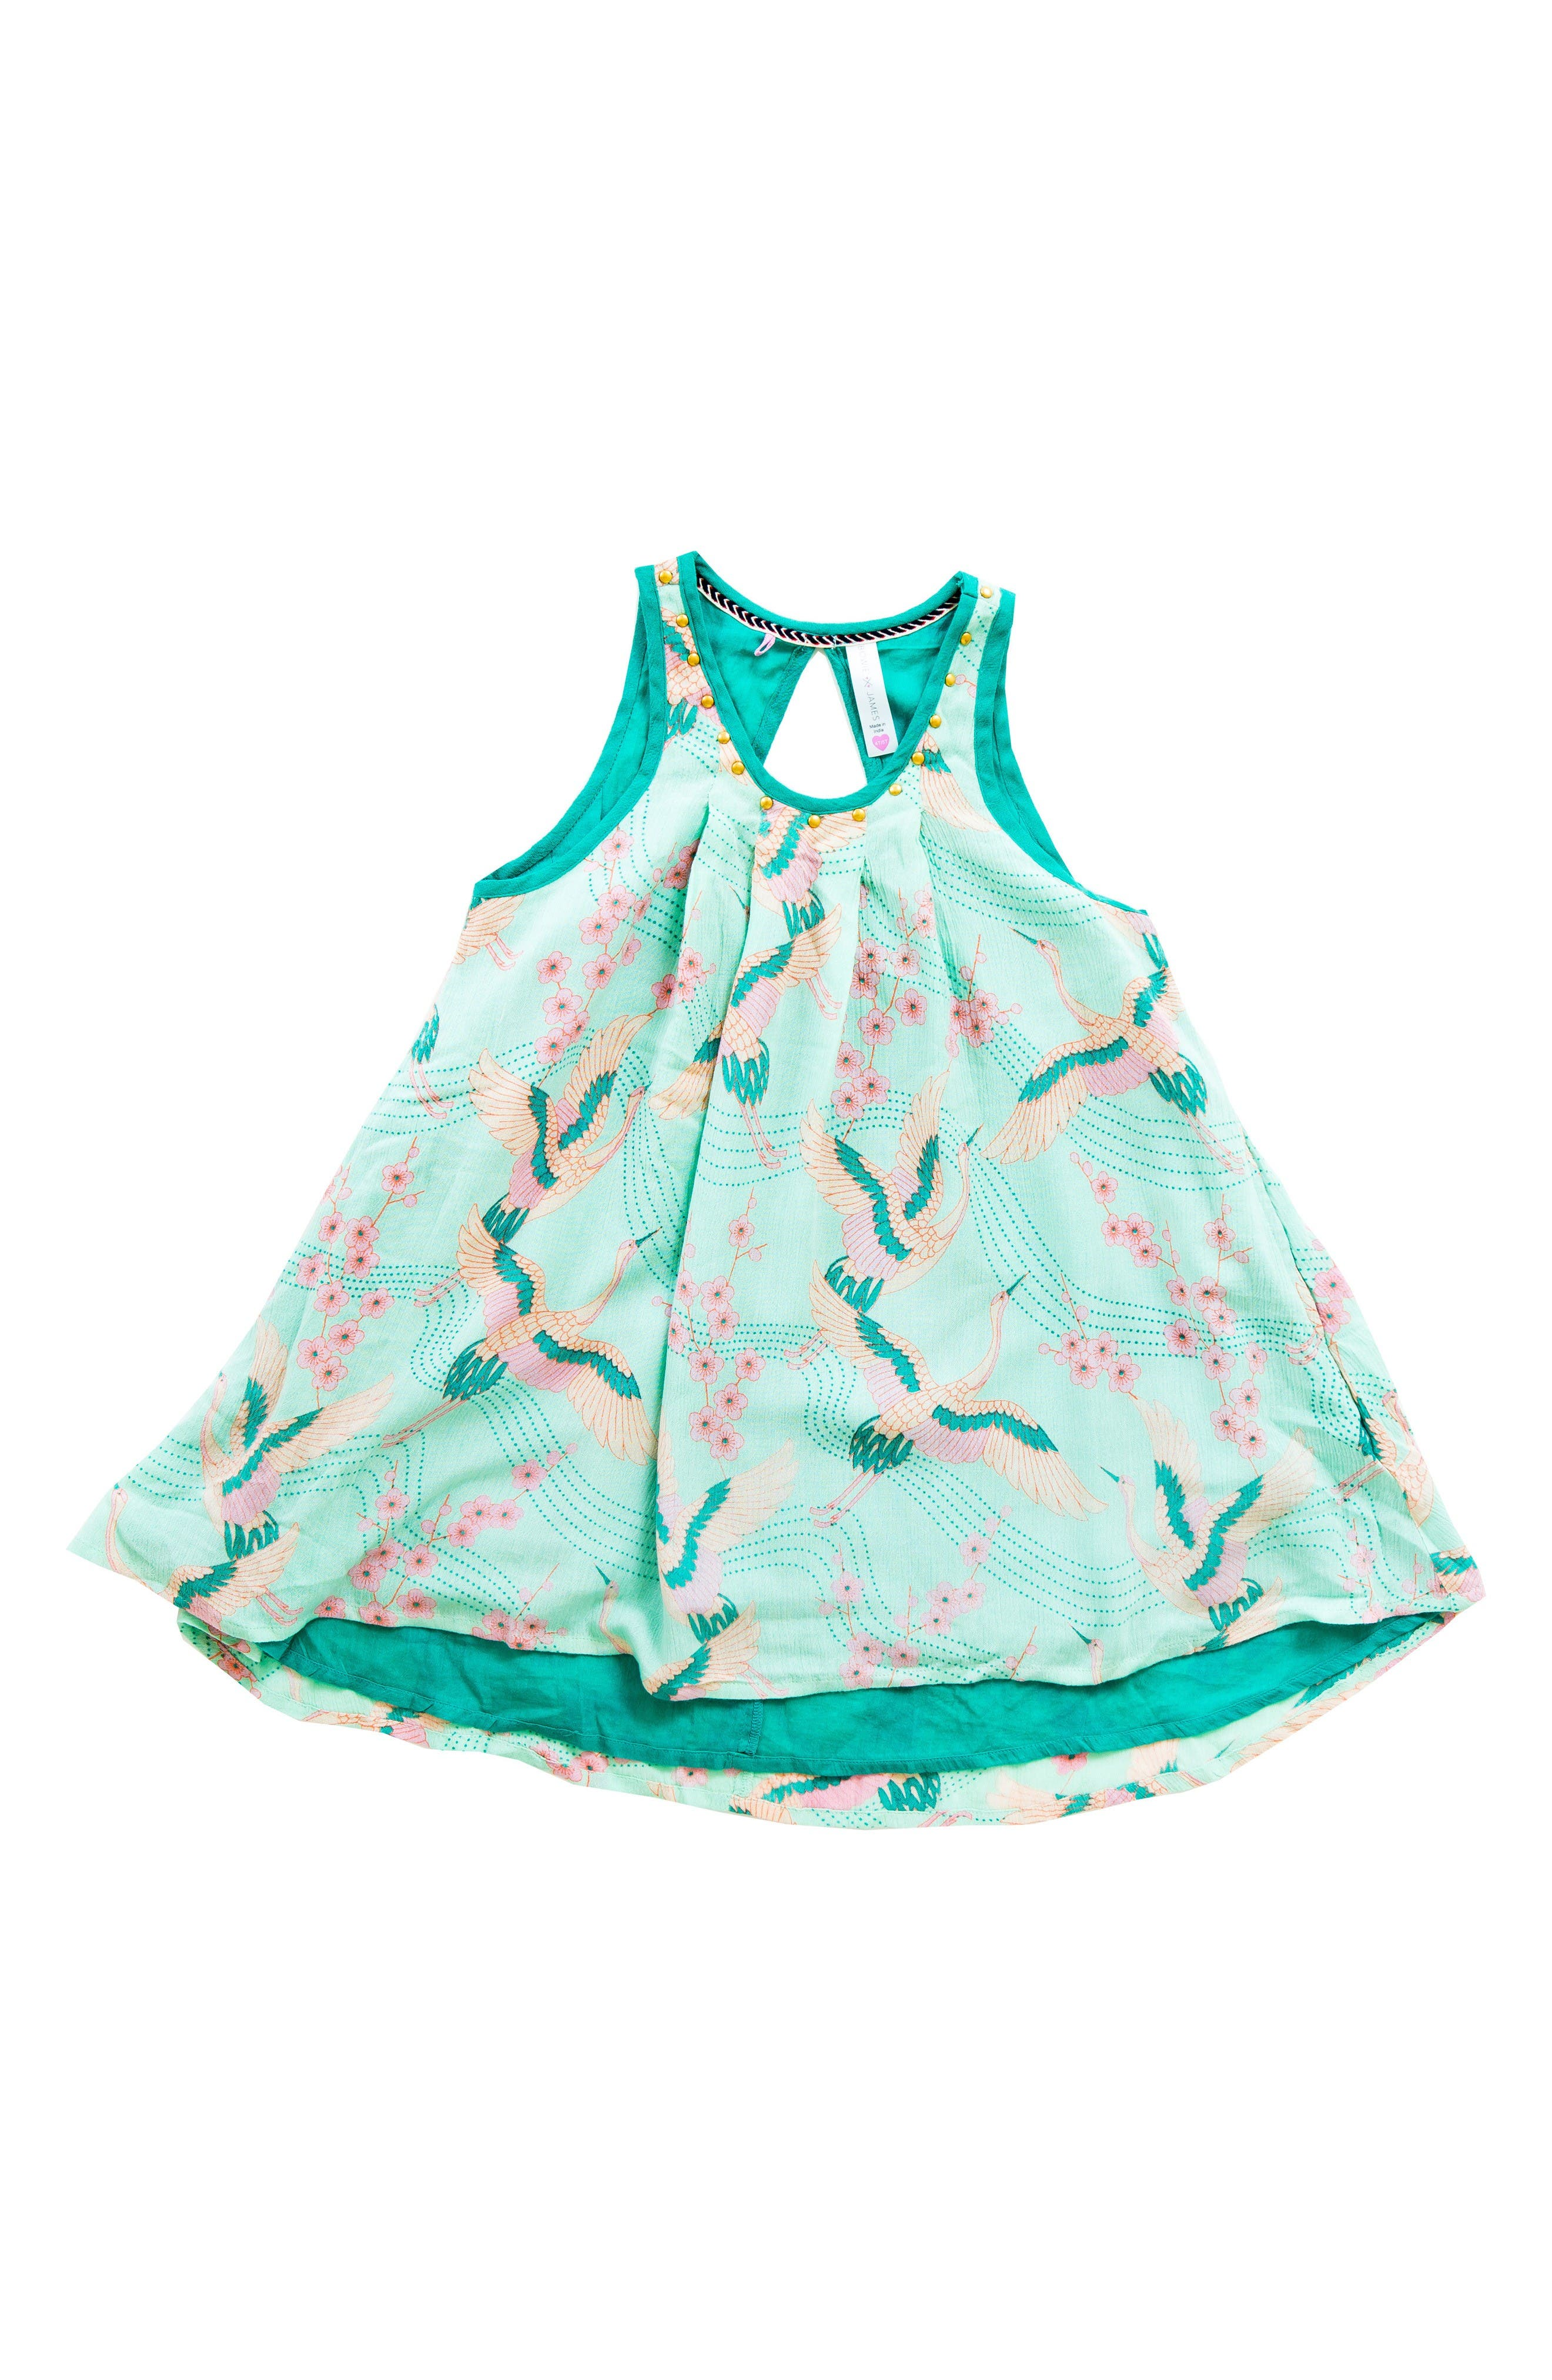 Alternate Image 1 Selected - BOWIE X JAMES Print Trapeze Dress (Toddler Girls, Little Girls & Big Girls)